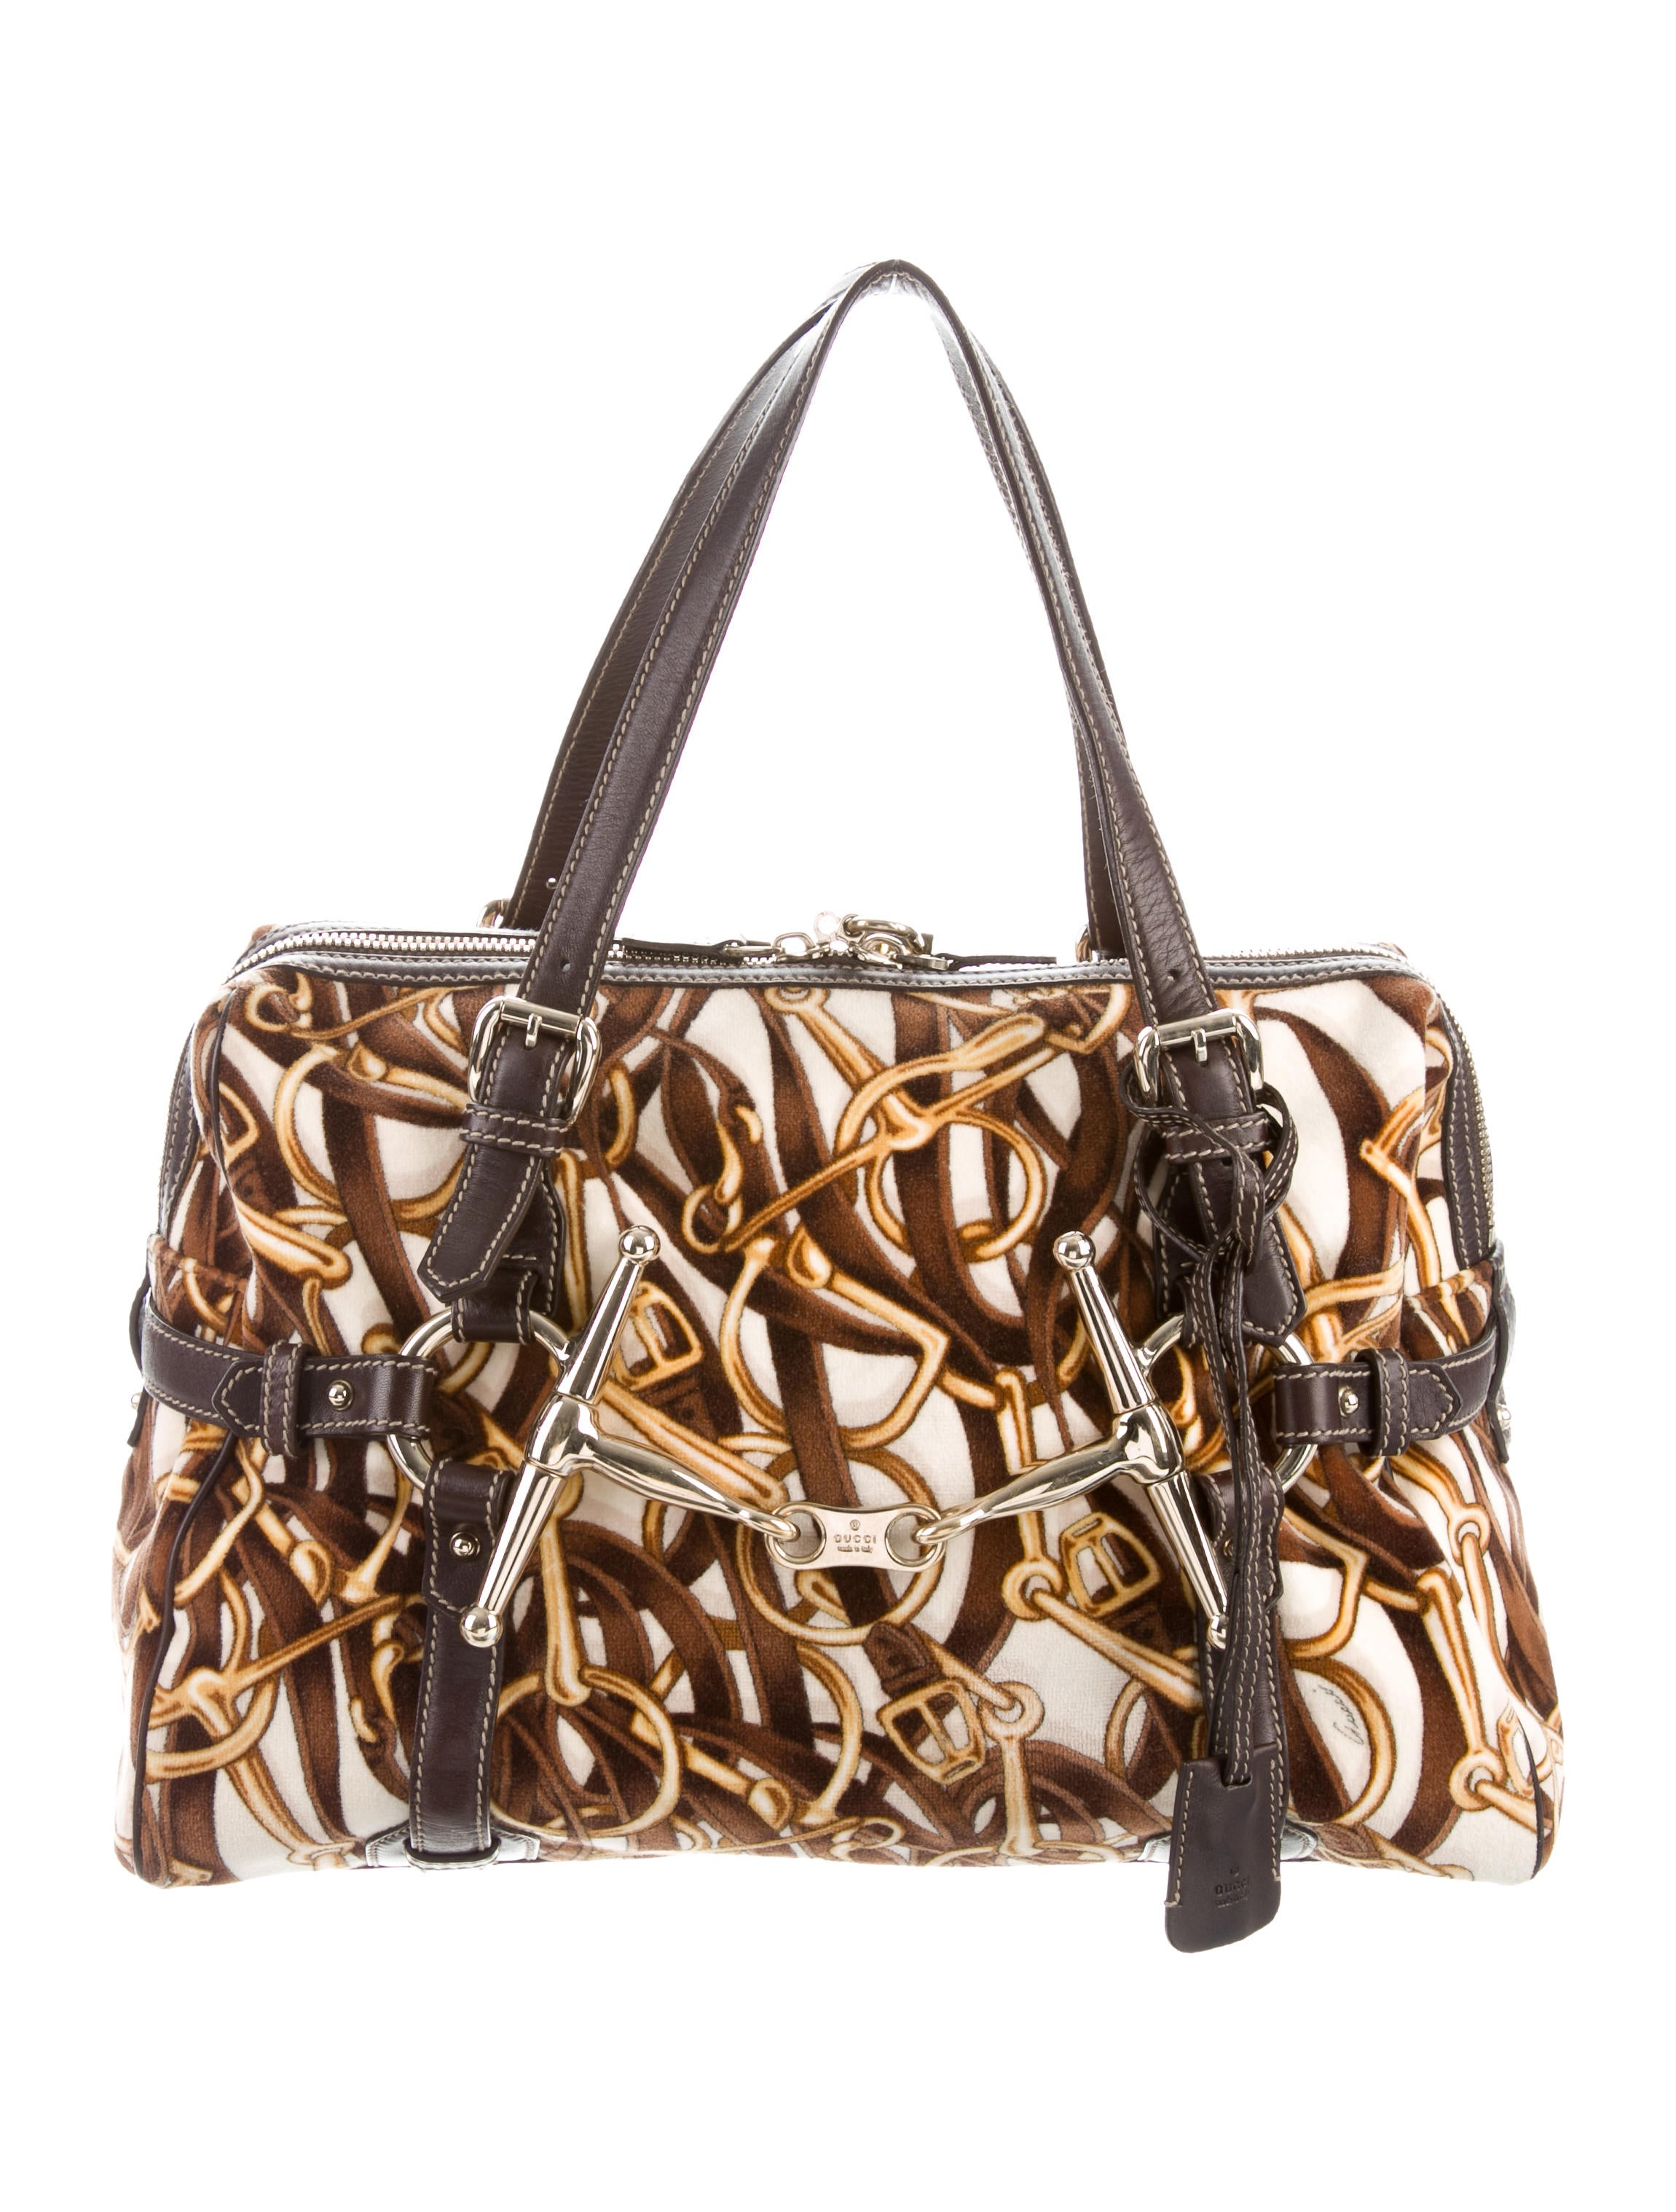 68aa4b37dd54 Gucci 85th Anniversary Boston Bag - Handbags - GUC233151 | The RealReal